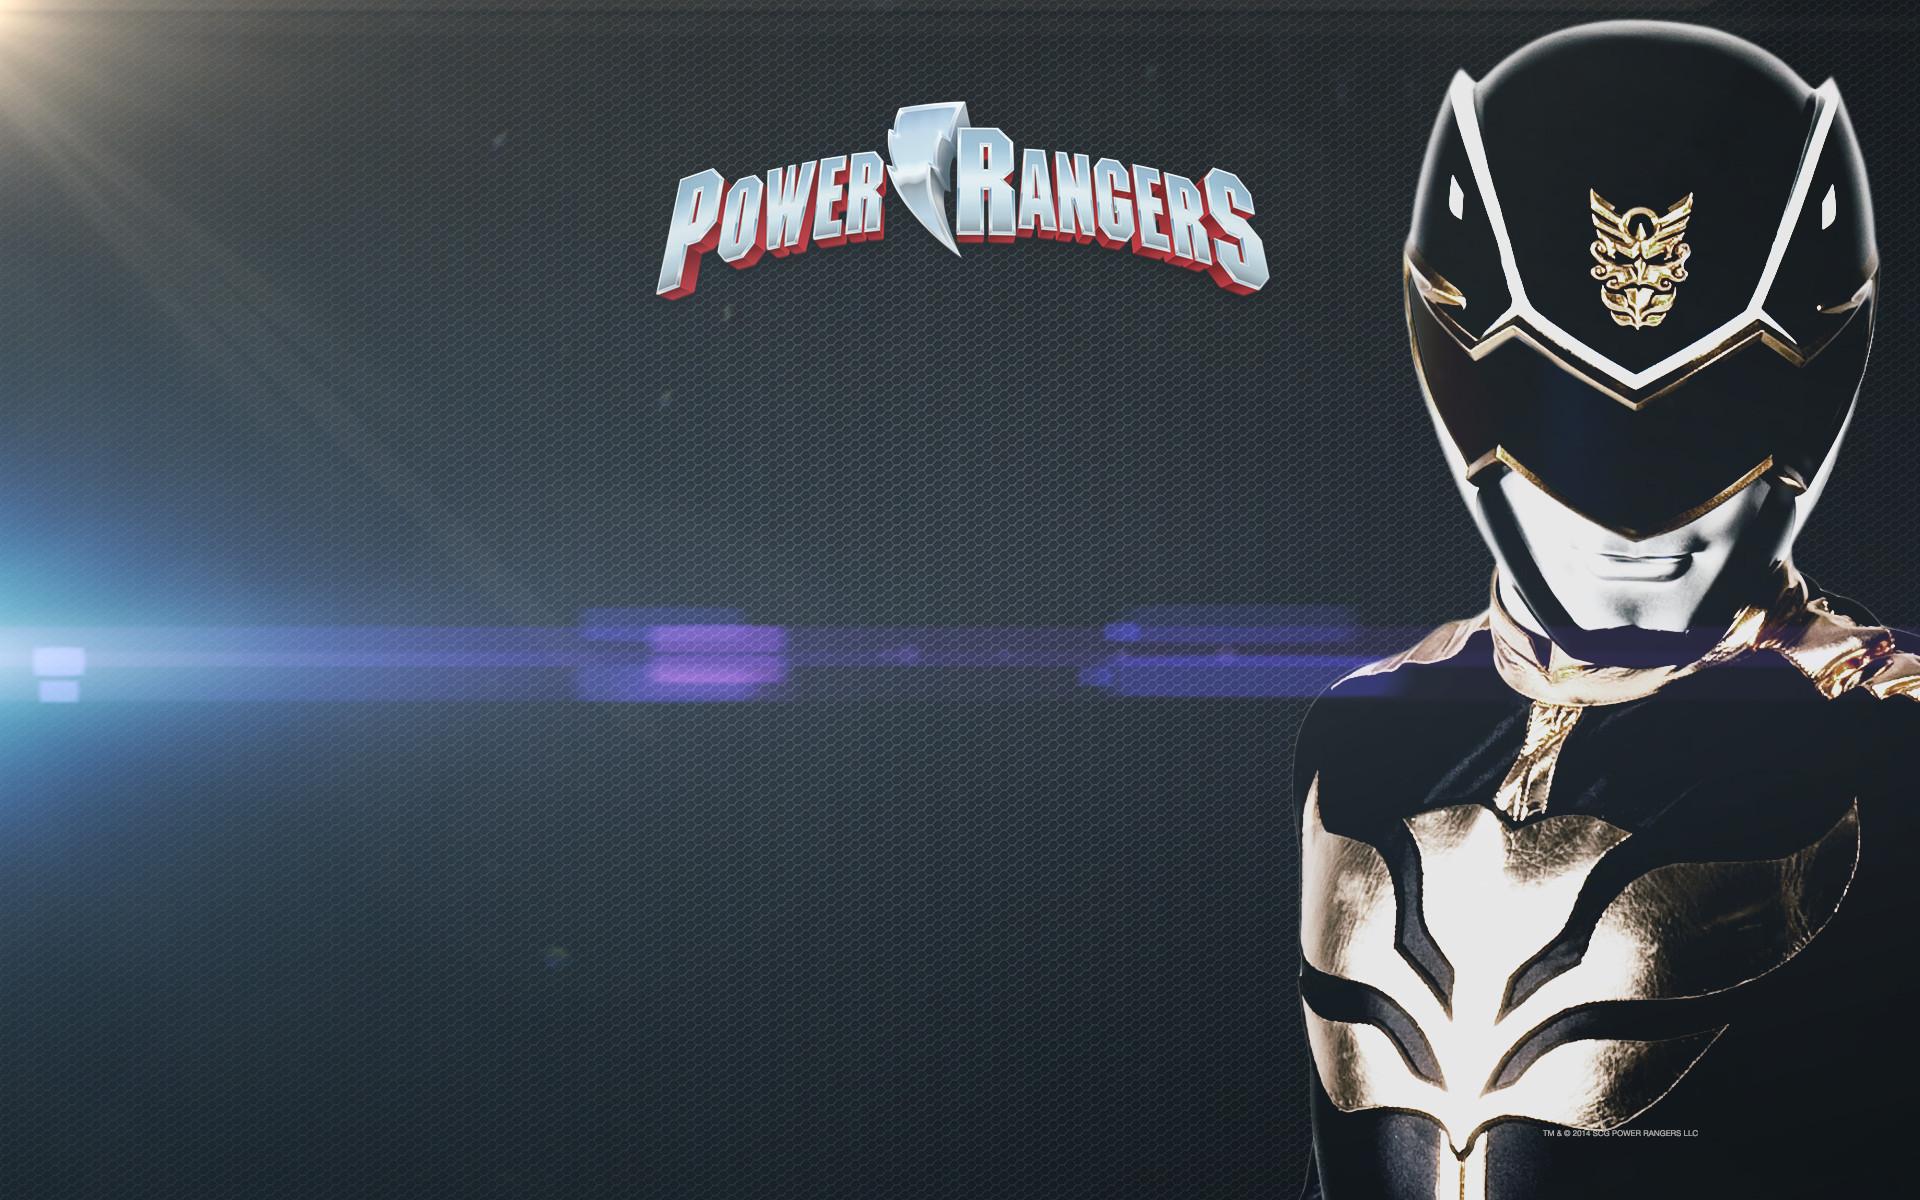 Power Rangers Wallpaper: Megaforce Black |Fun Desktop Wallpapers for .